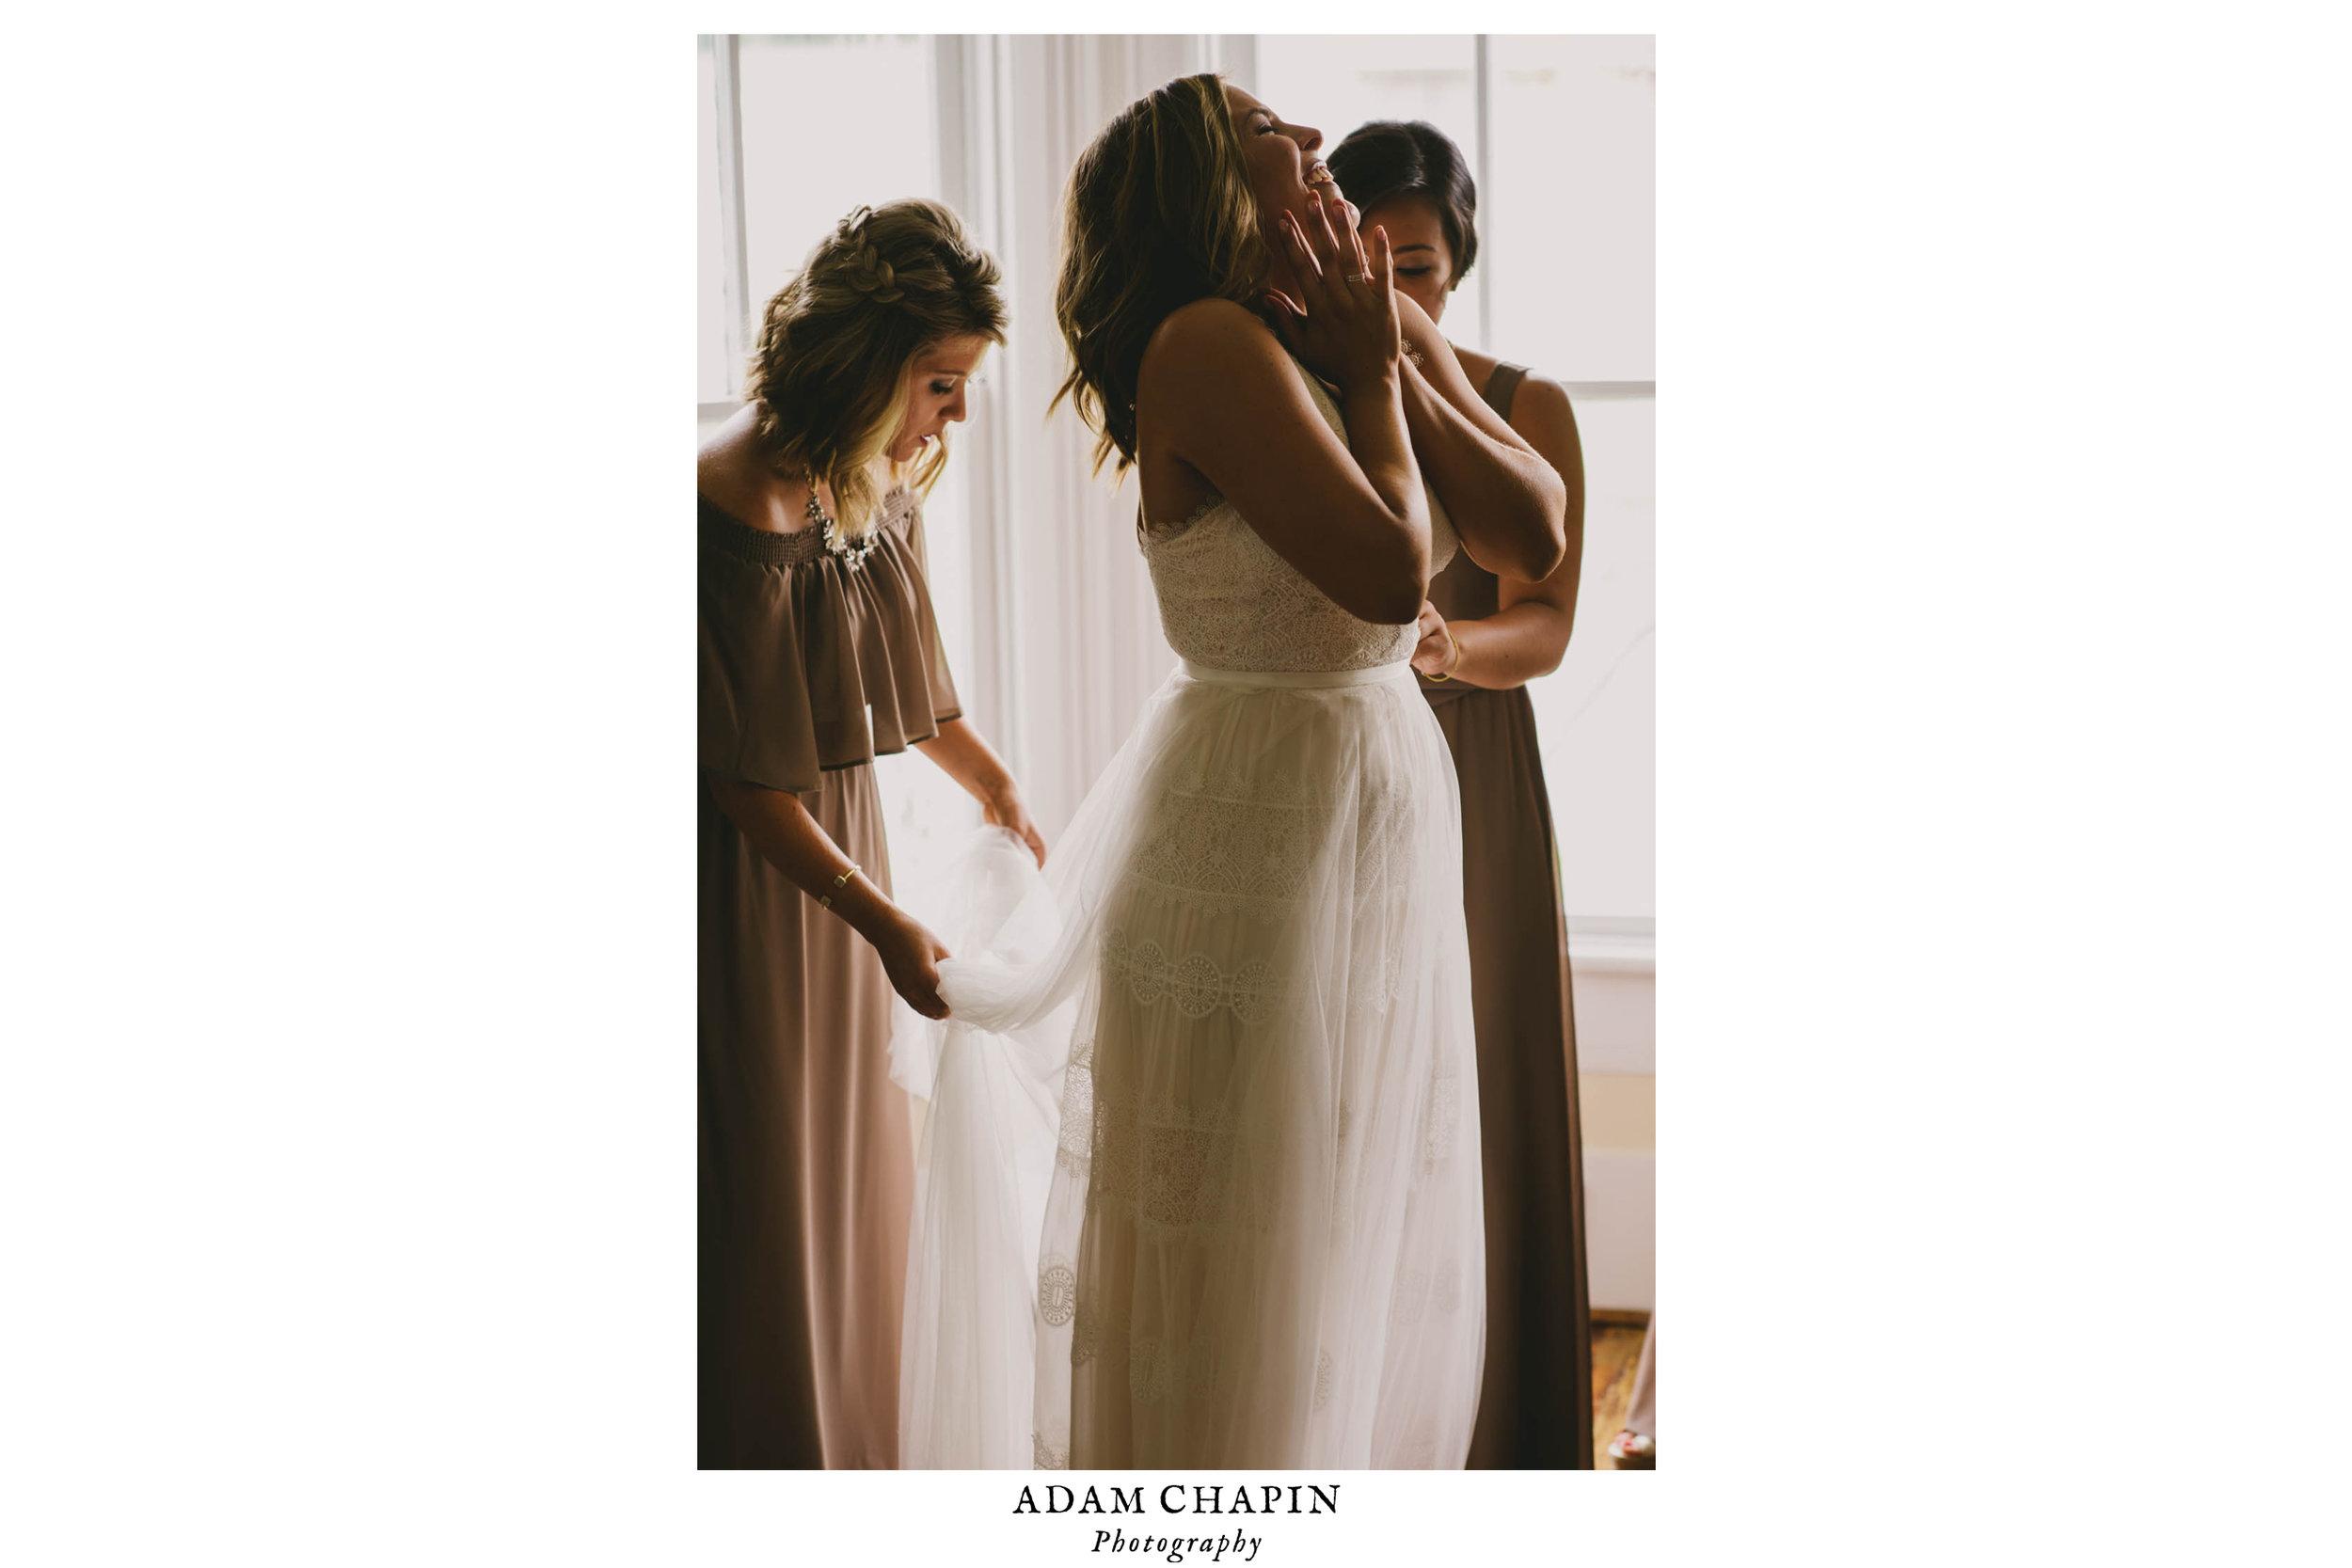 mims-house-wedding-bride-getting-ready-photo.jpg